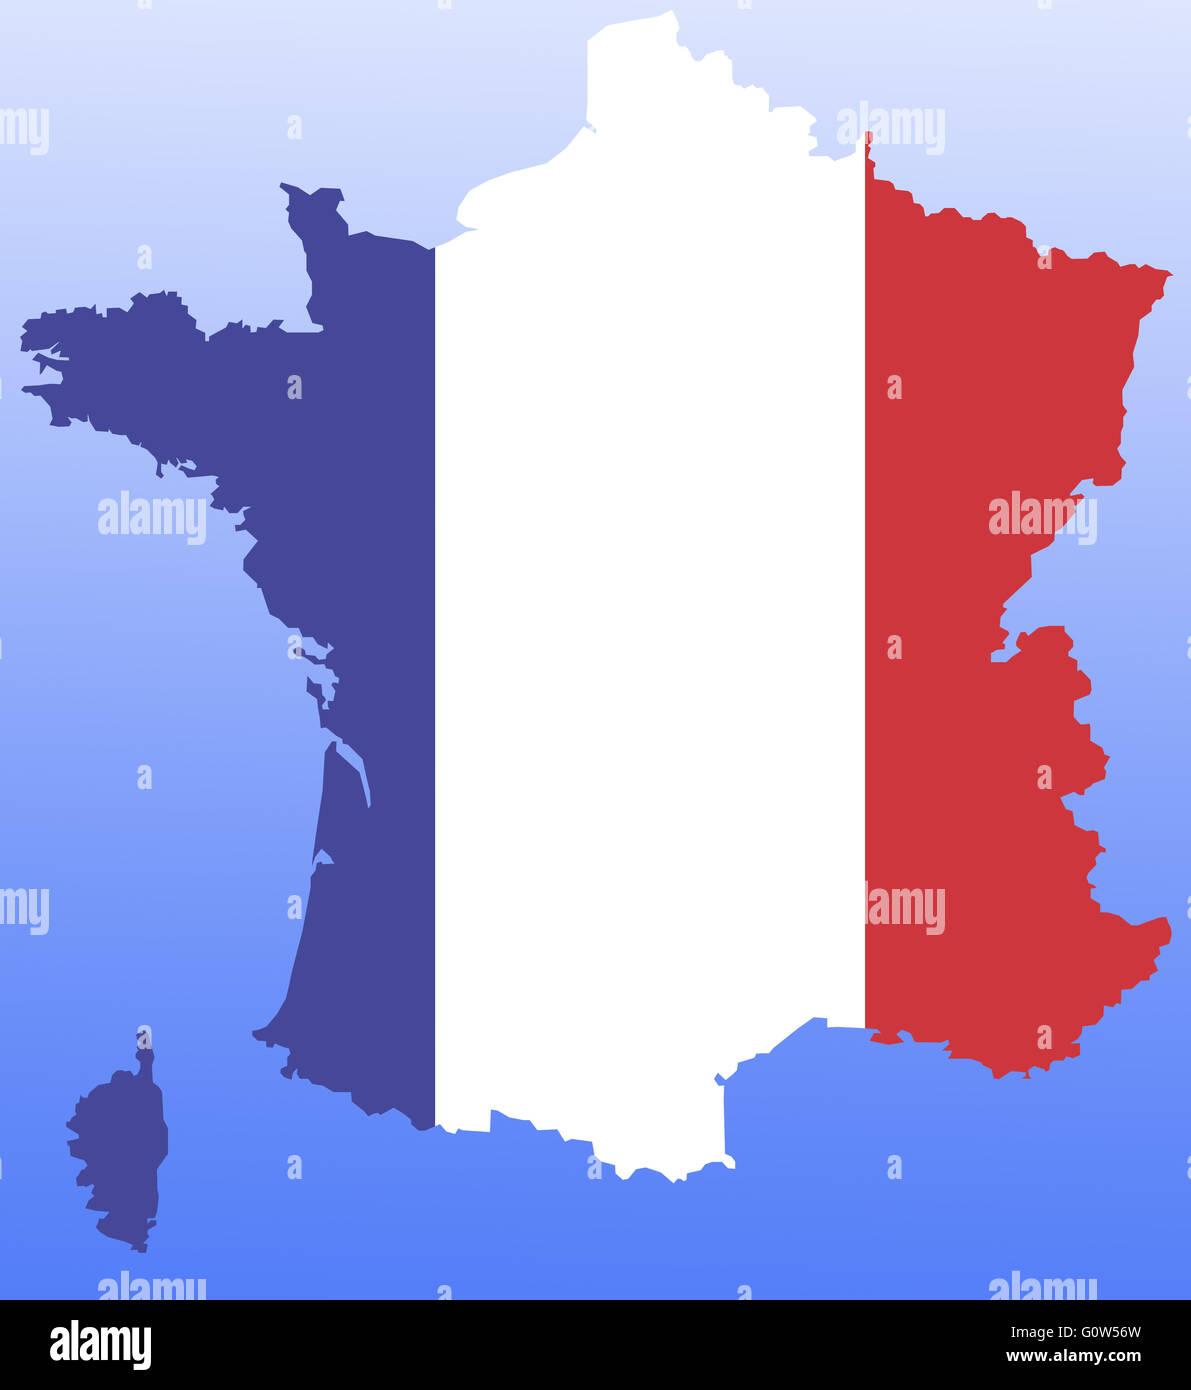 Symbolbild: Frankreich: Laenderumriss Mit Flagge / symbolischen Bild: Frankreich: Gliederung und Flagge. Stockbild